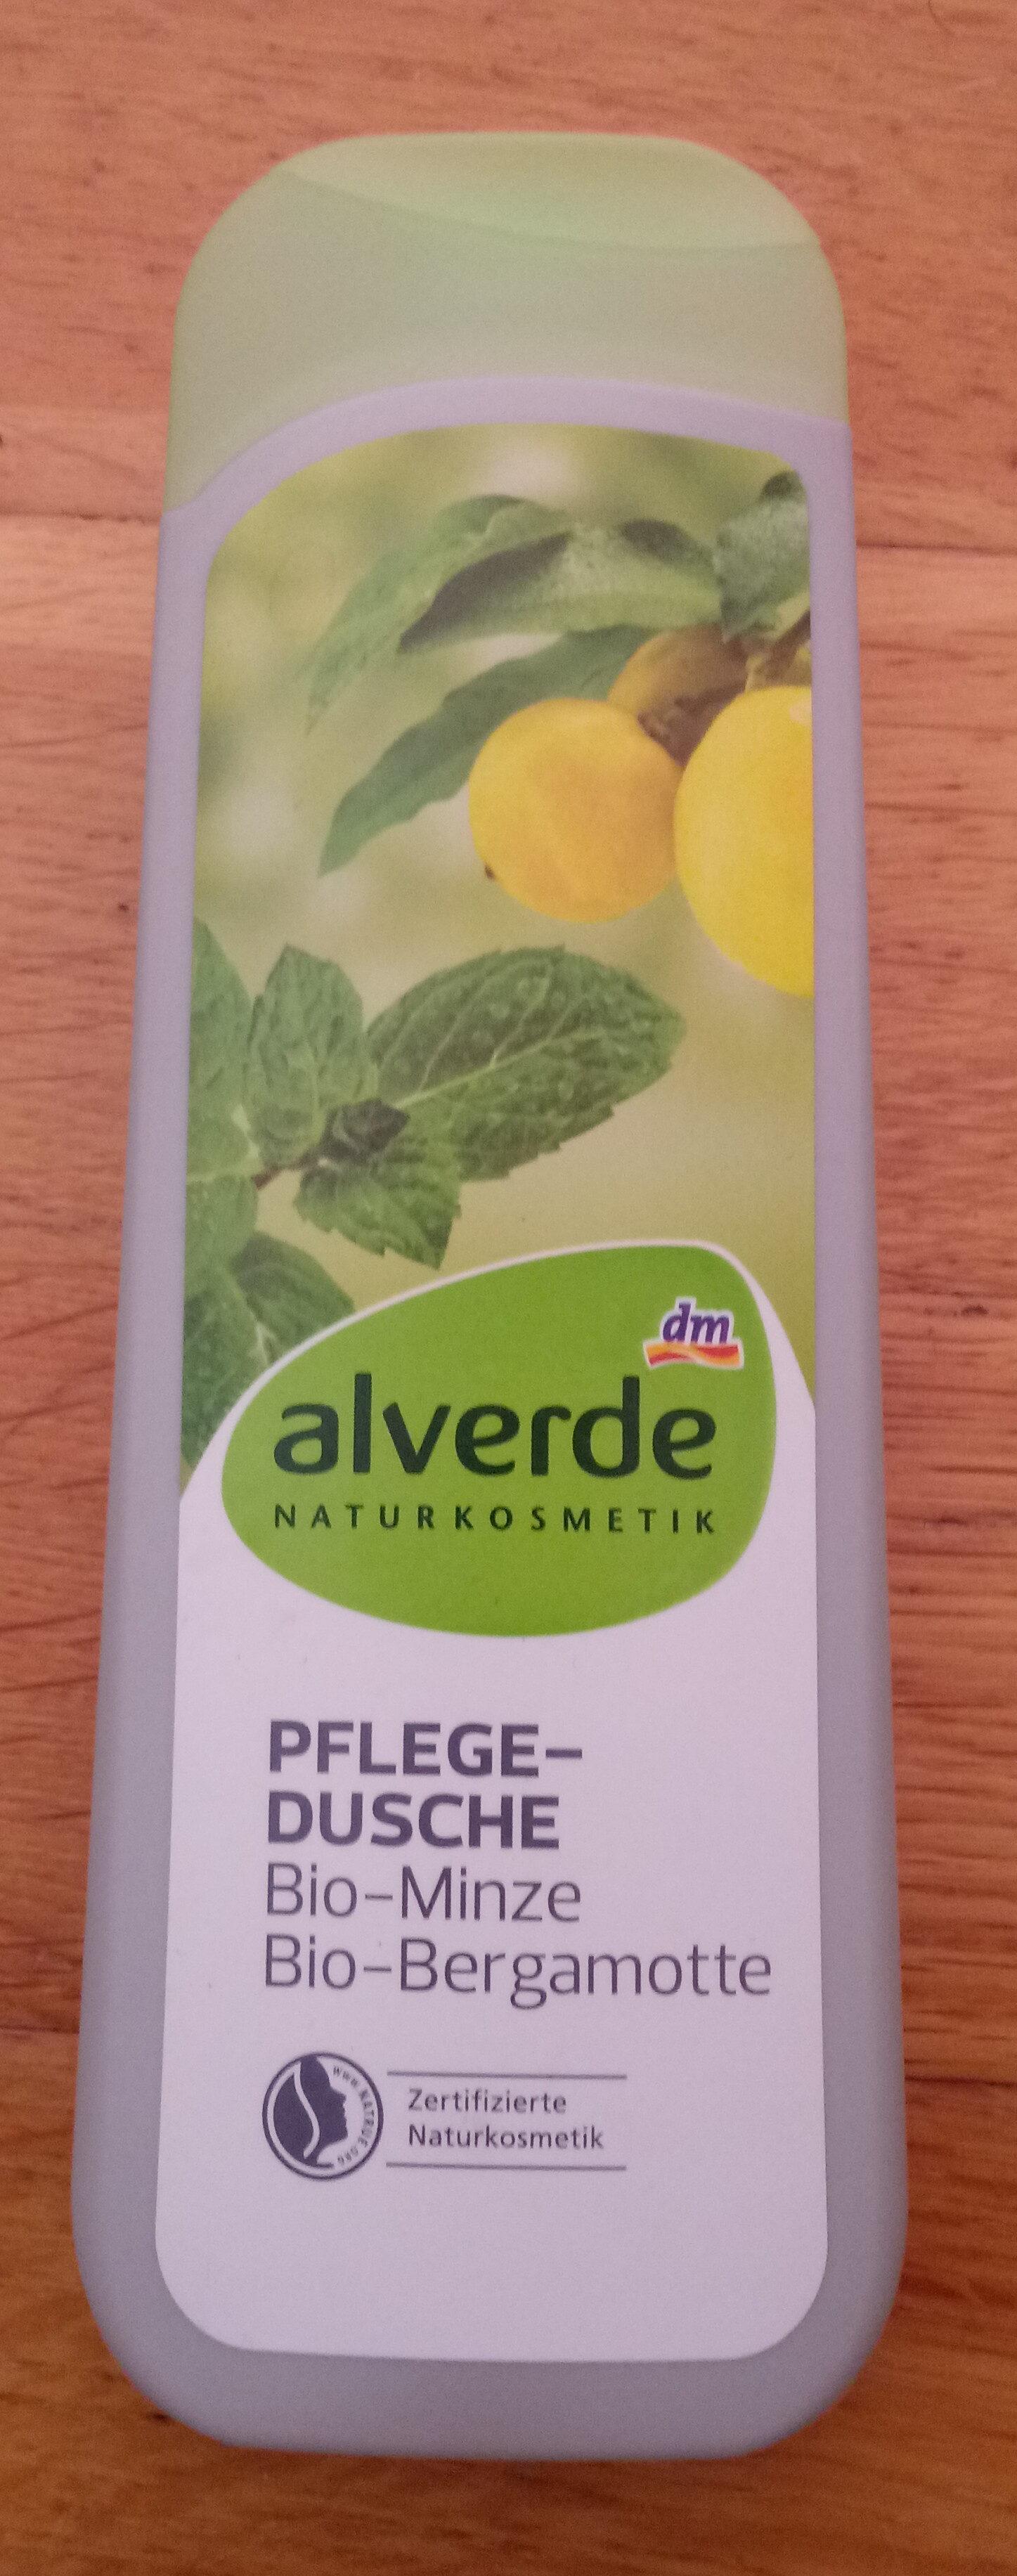 Pflegedusche Bio-Minze Bio-Bergamotte - Product